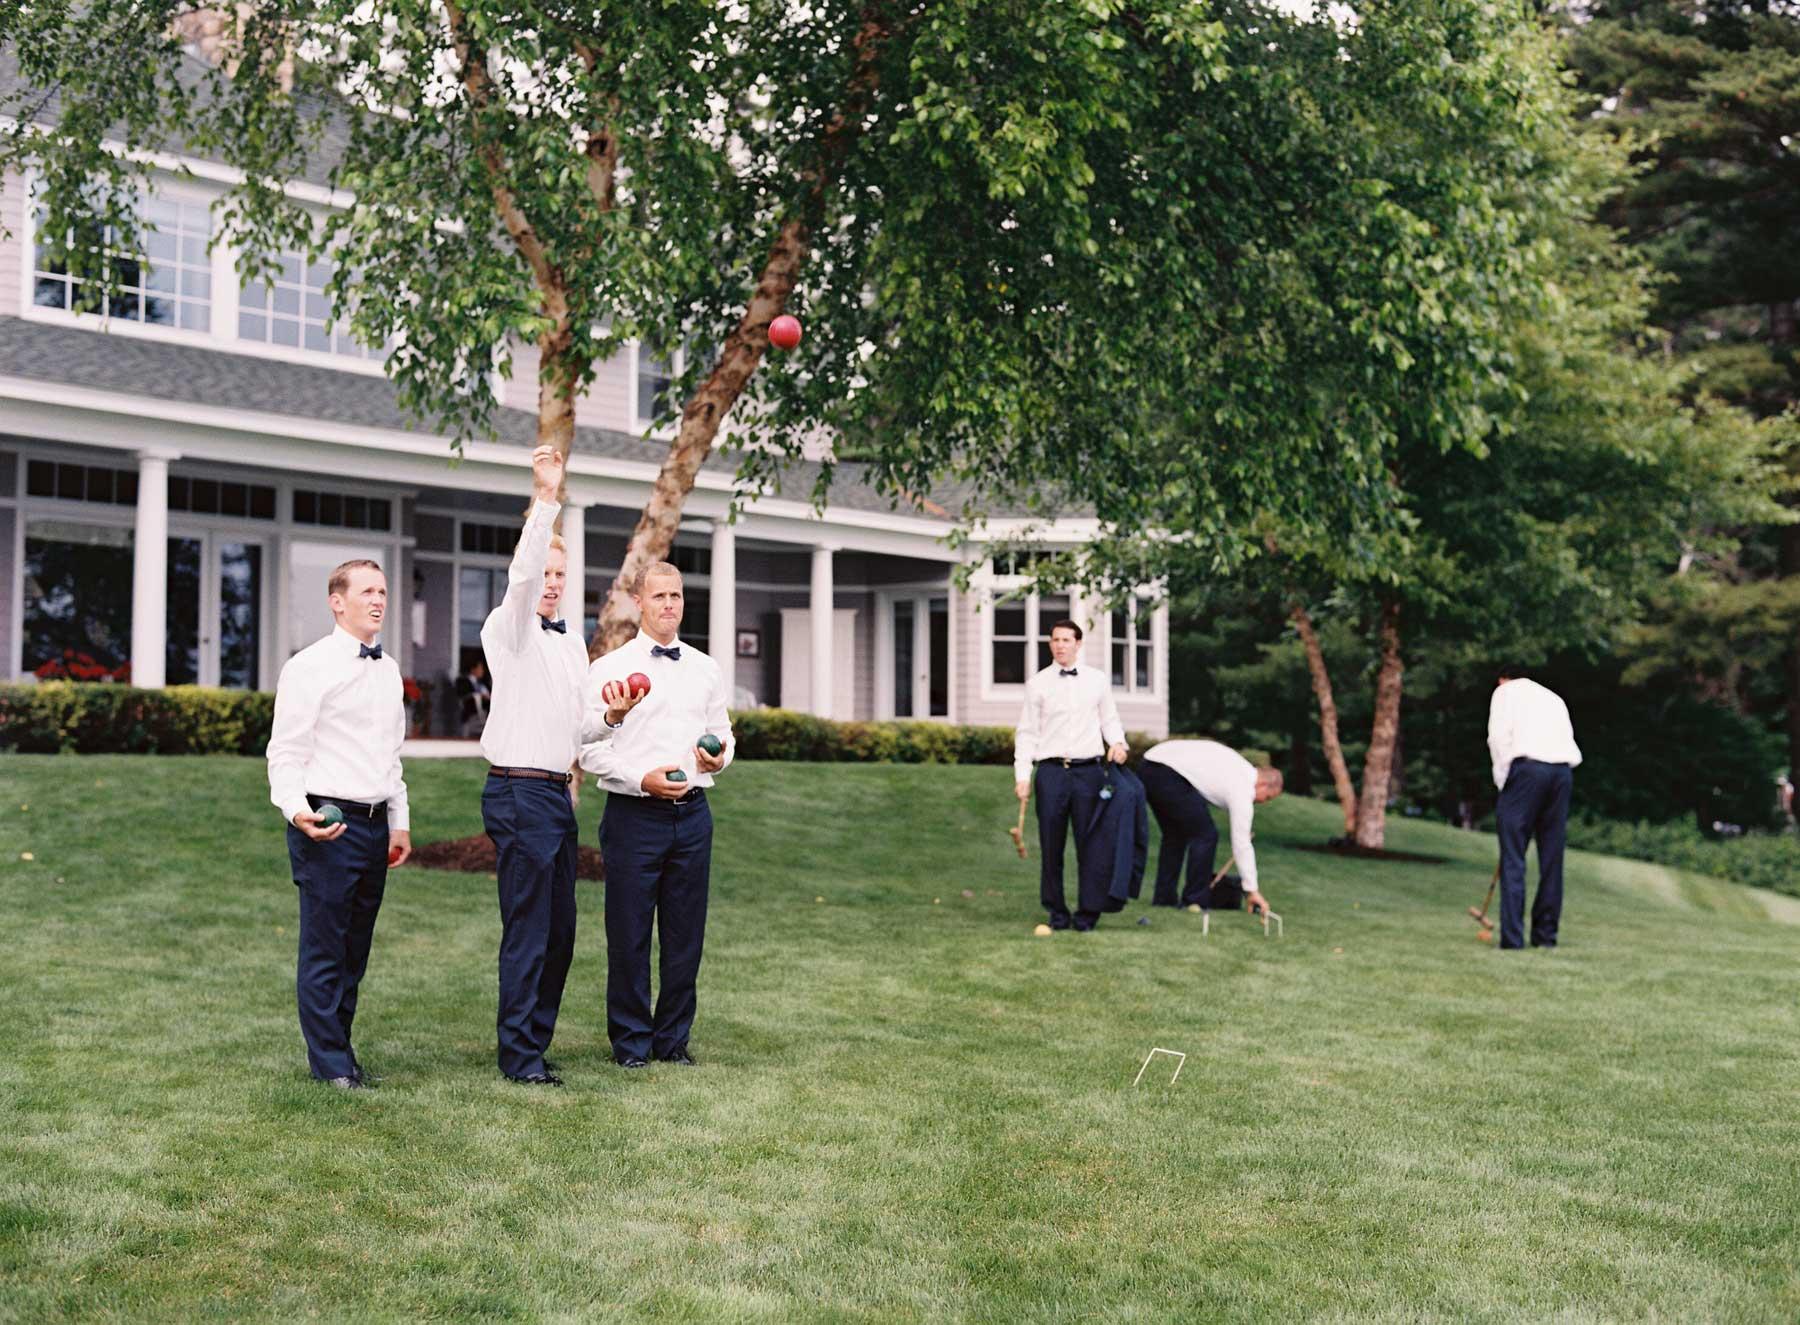 lawn games for wedding reception, outdoor wedding reception activities